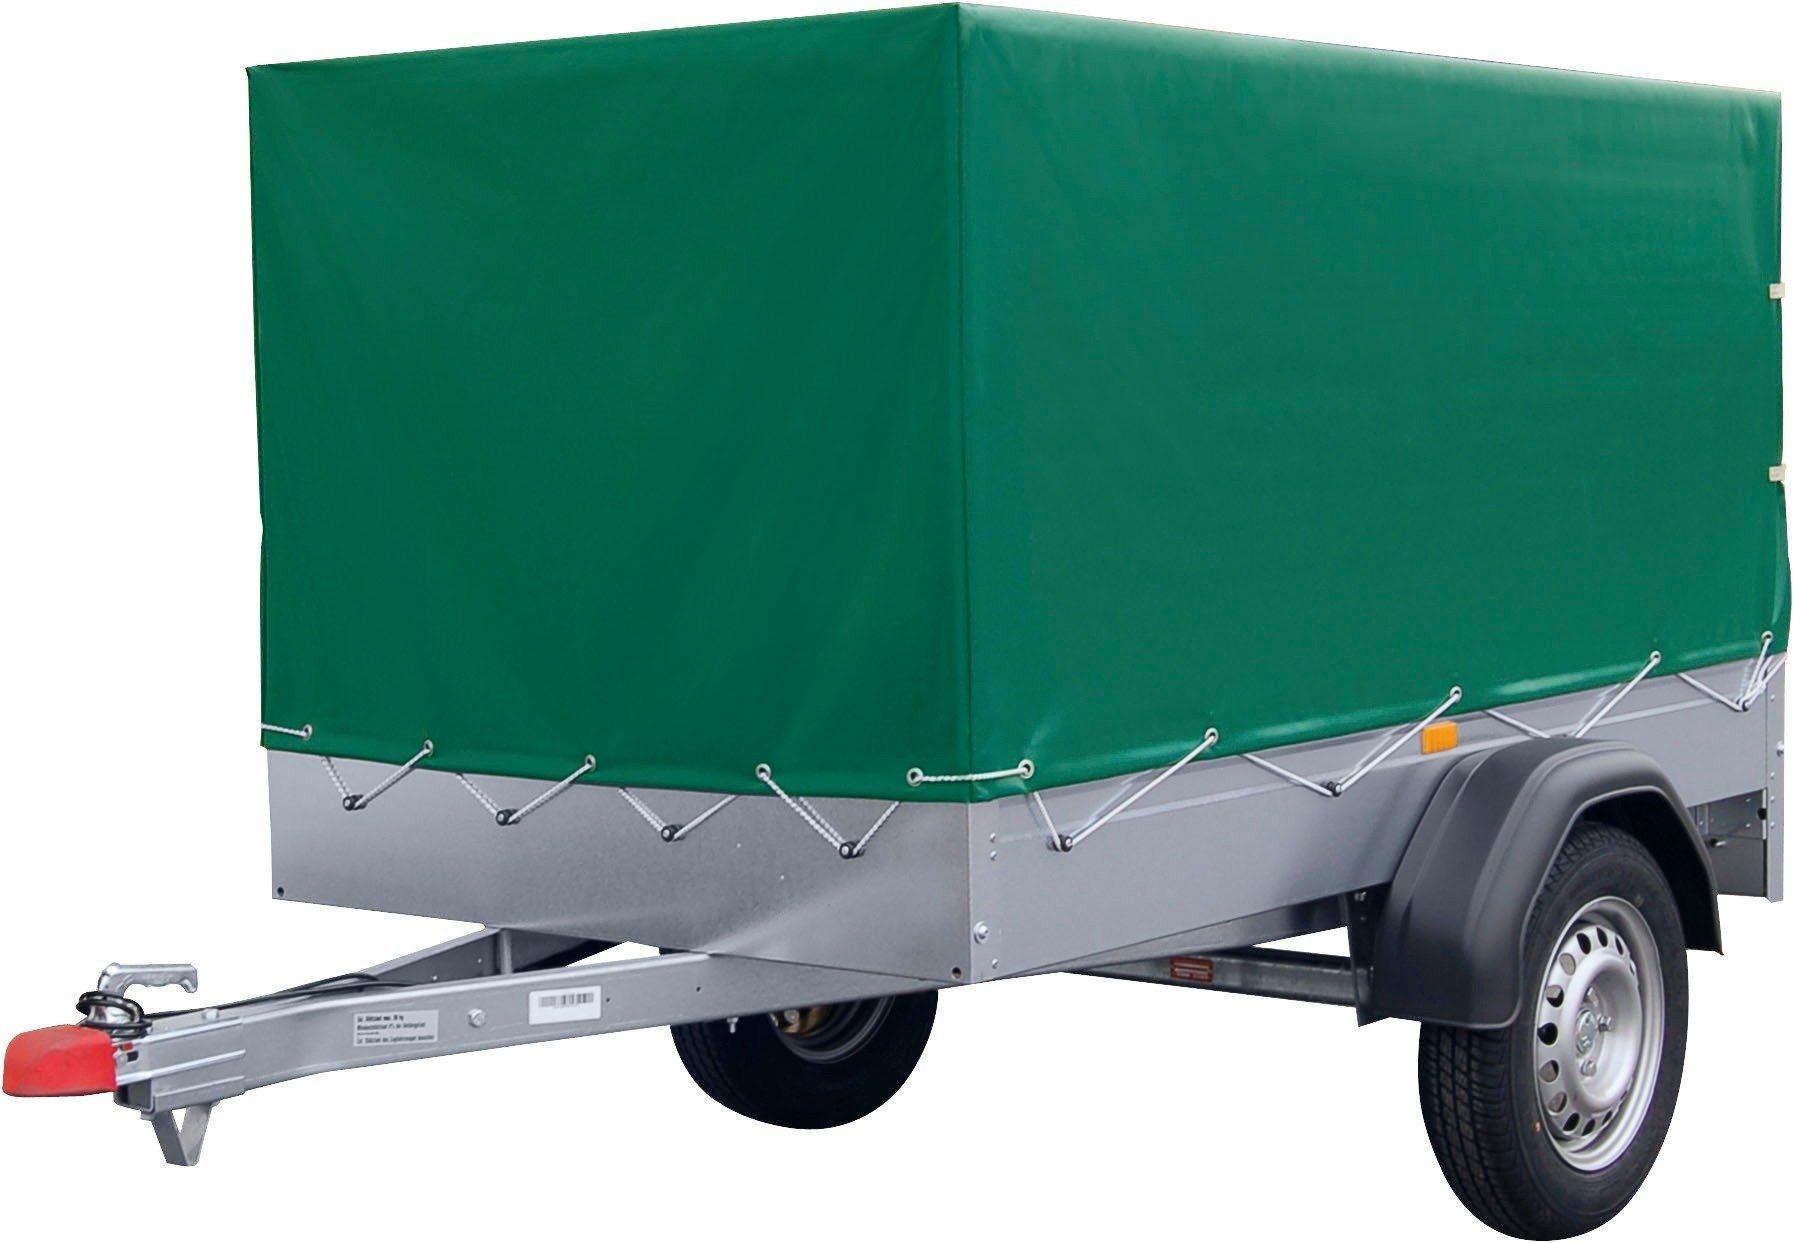 pkw anh nger 750 kg preisvergleich die besten angebote. Black Bedroom Furniture Sets. Home Design Ideas